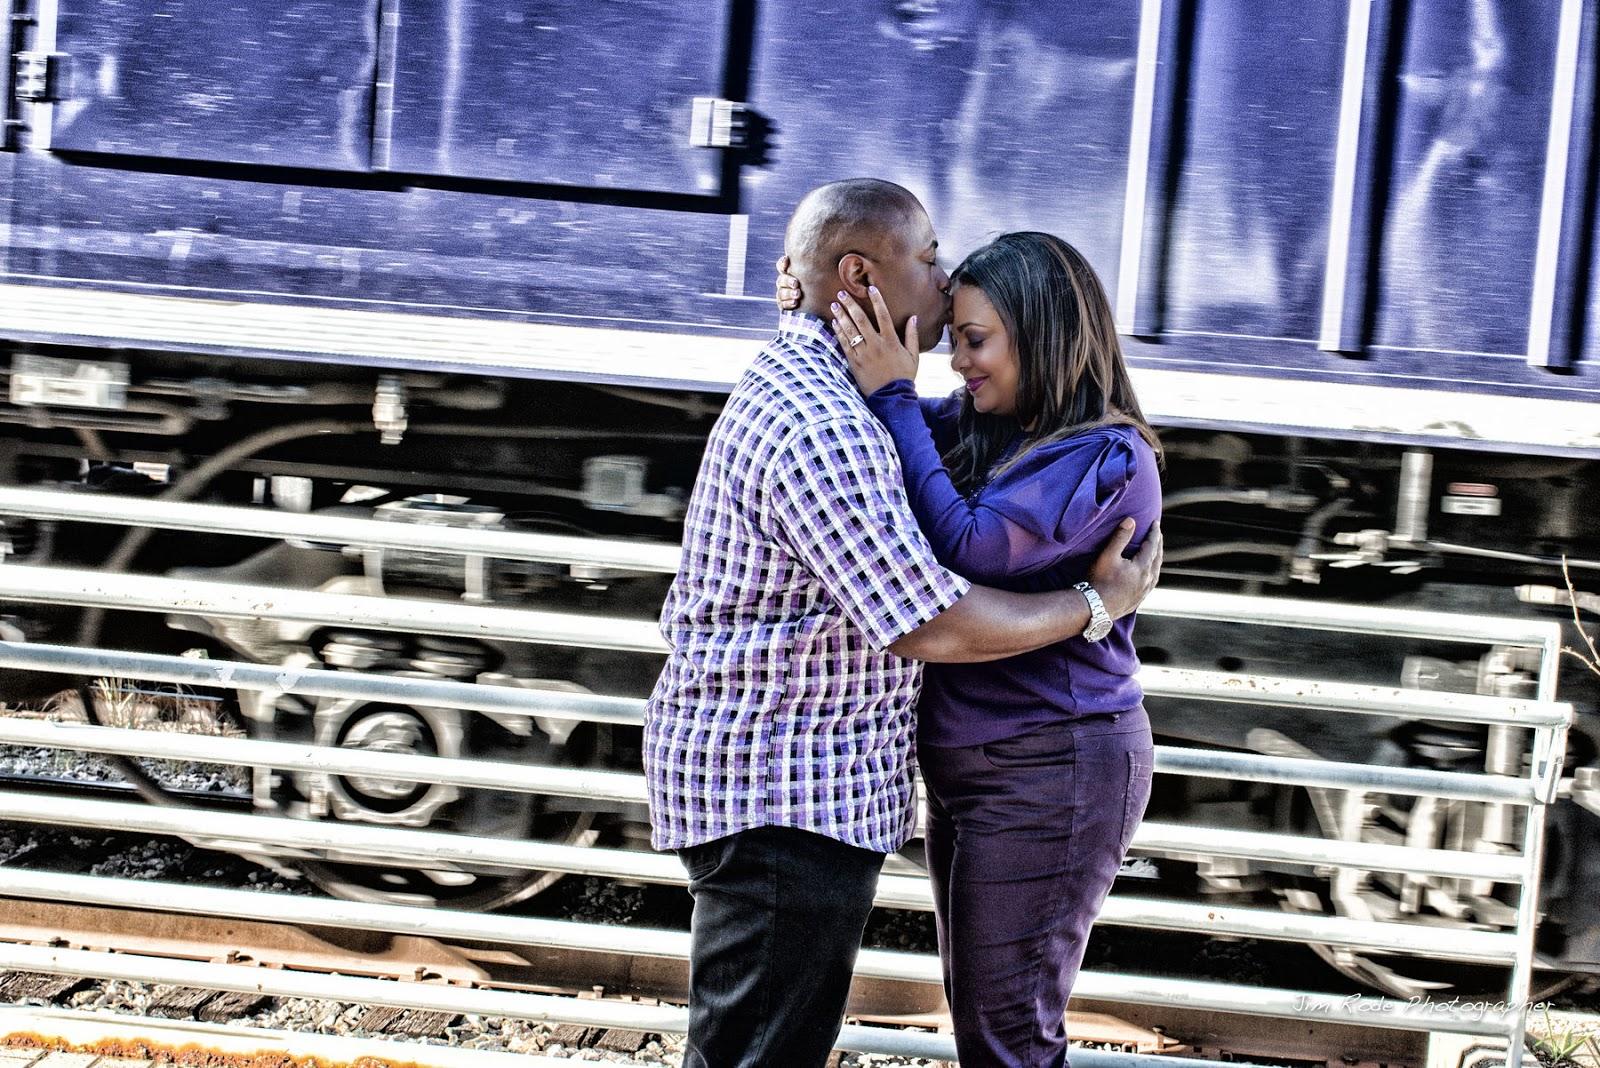 engagement kiss on Irving train platform